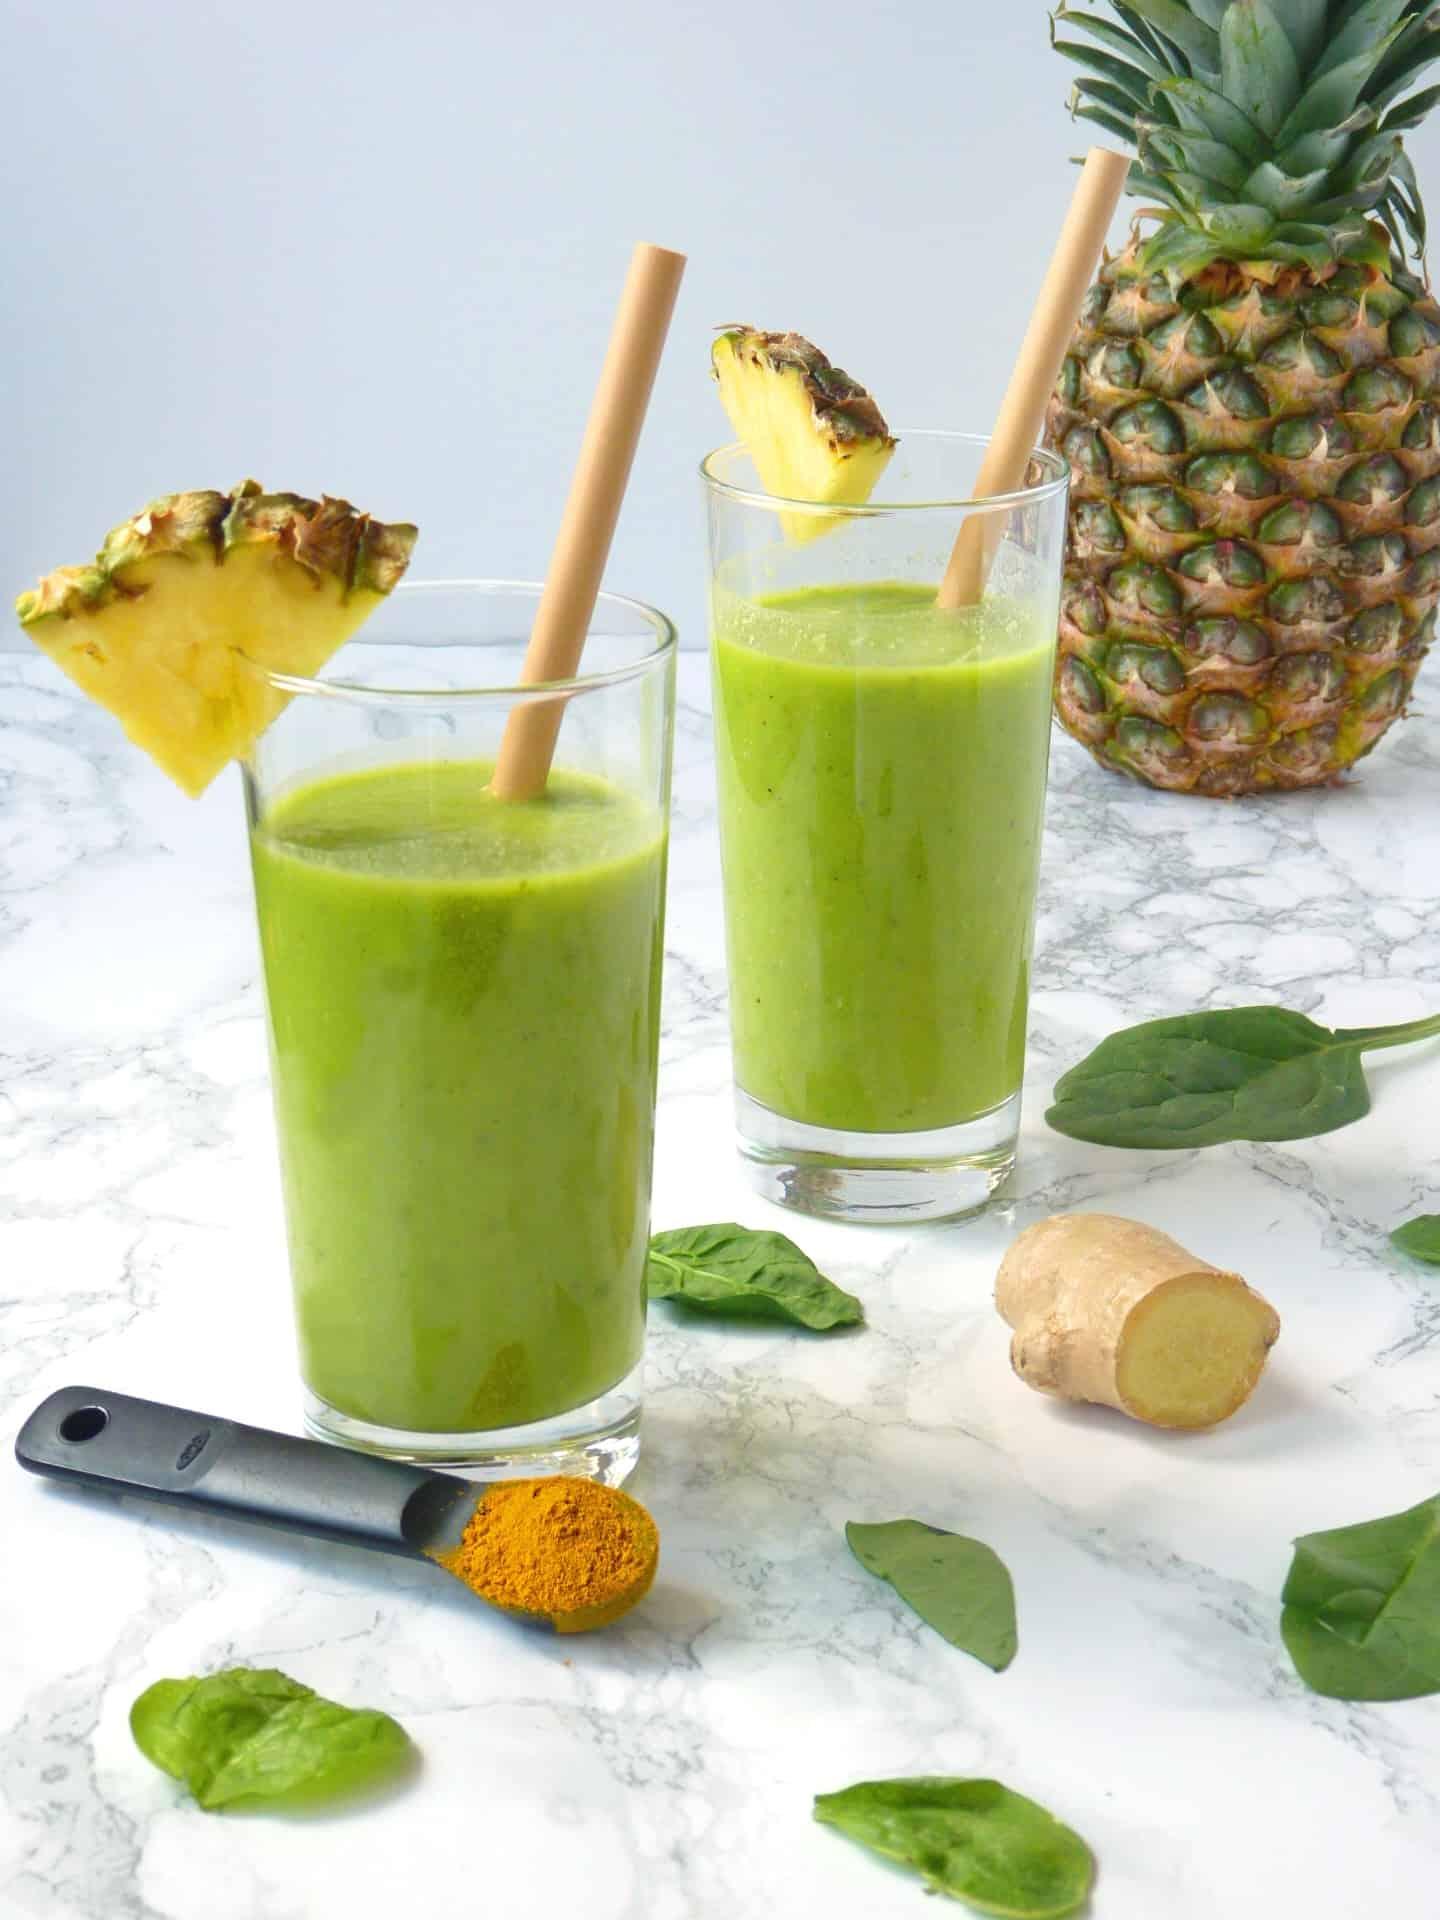 Pineapple Turmeric Anti-inflammatory smoothie